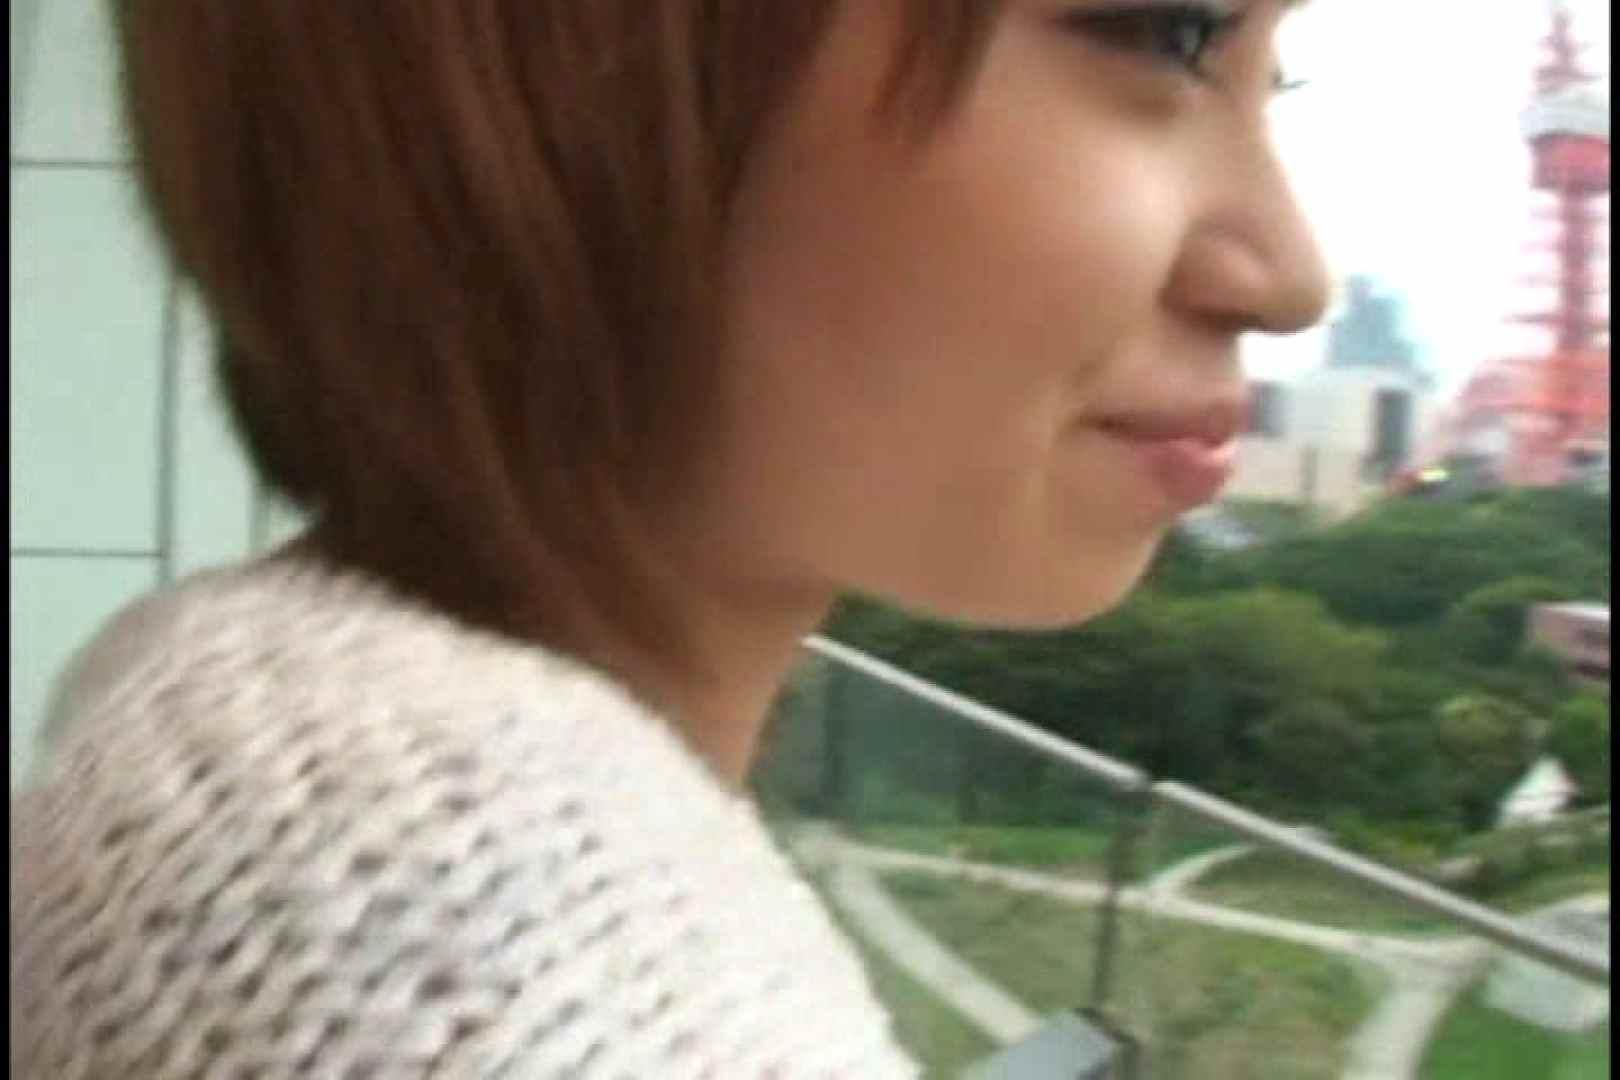 JDハンター全国ツアー vol.026 前編 女子大生のエロ生活   OLのエロ生活  104連発 67